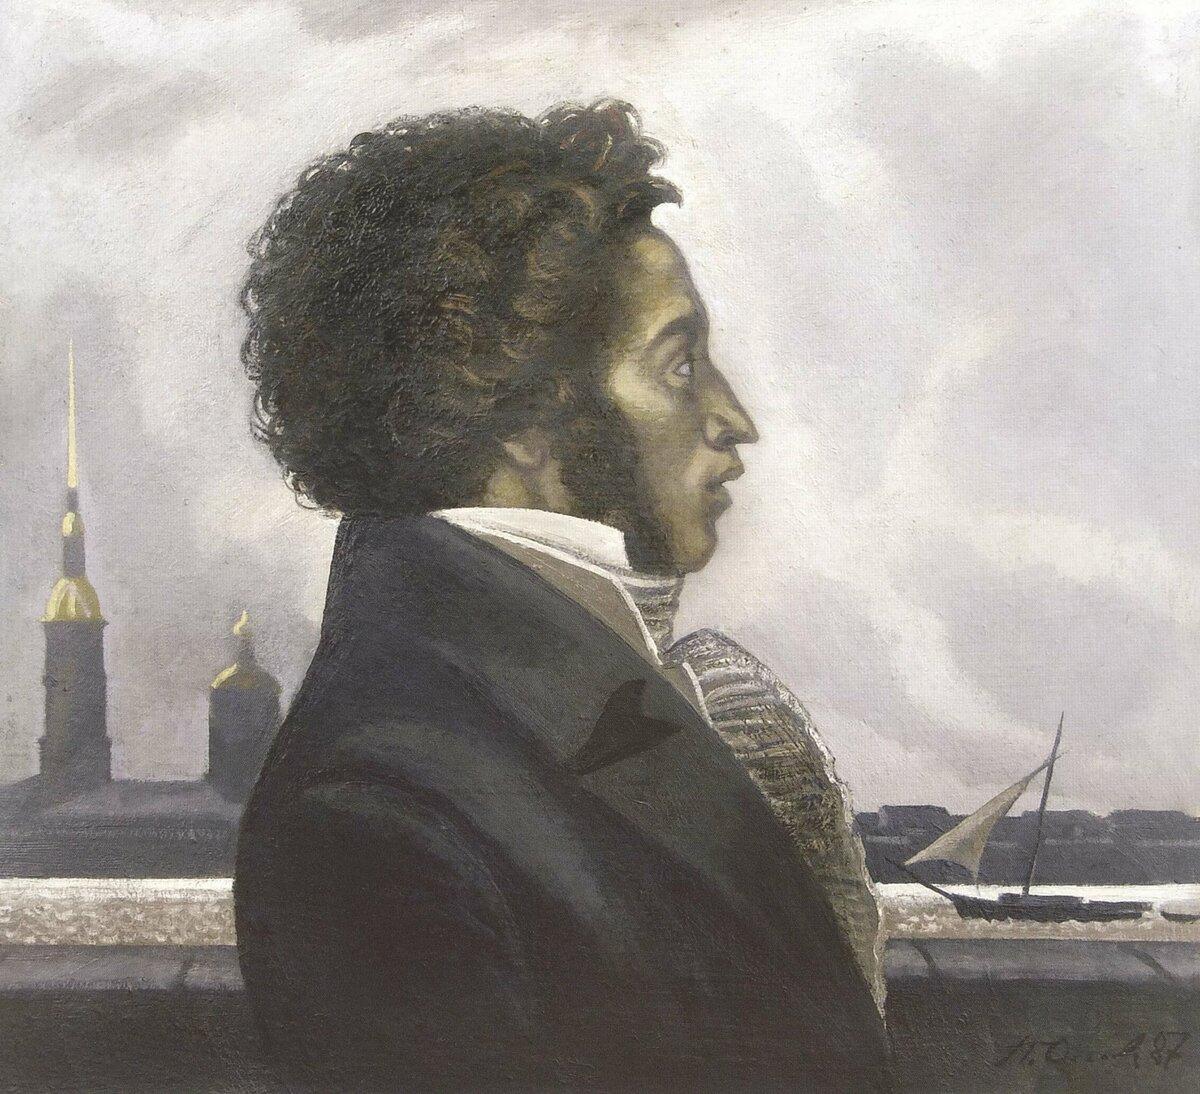 картинки александра пушкина маленькие всходы